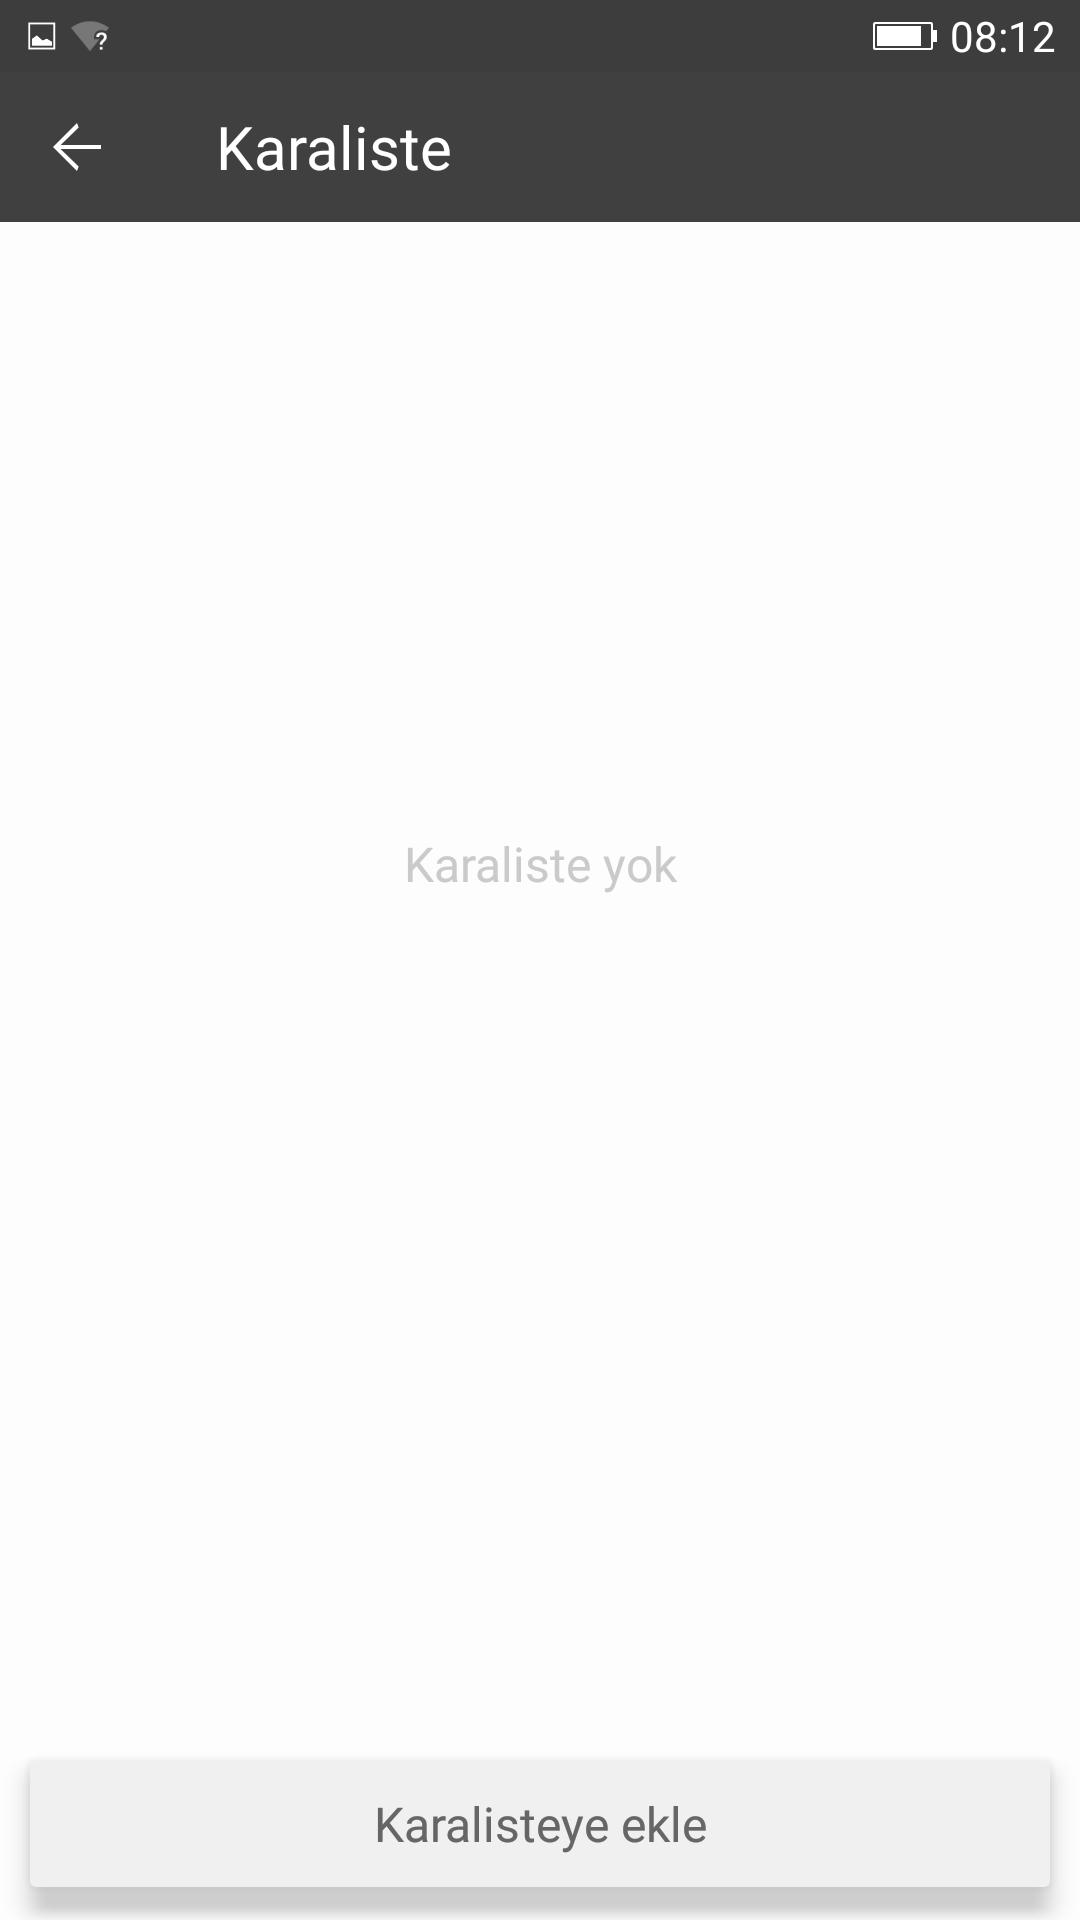 Screenshot_20160102-081252.png